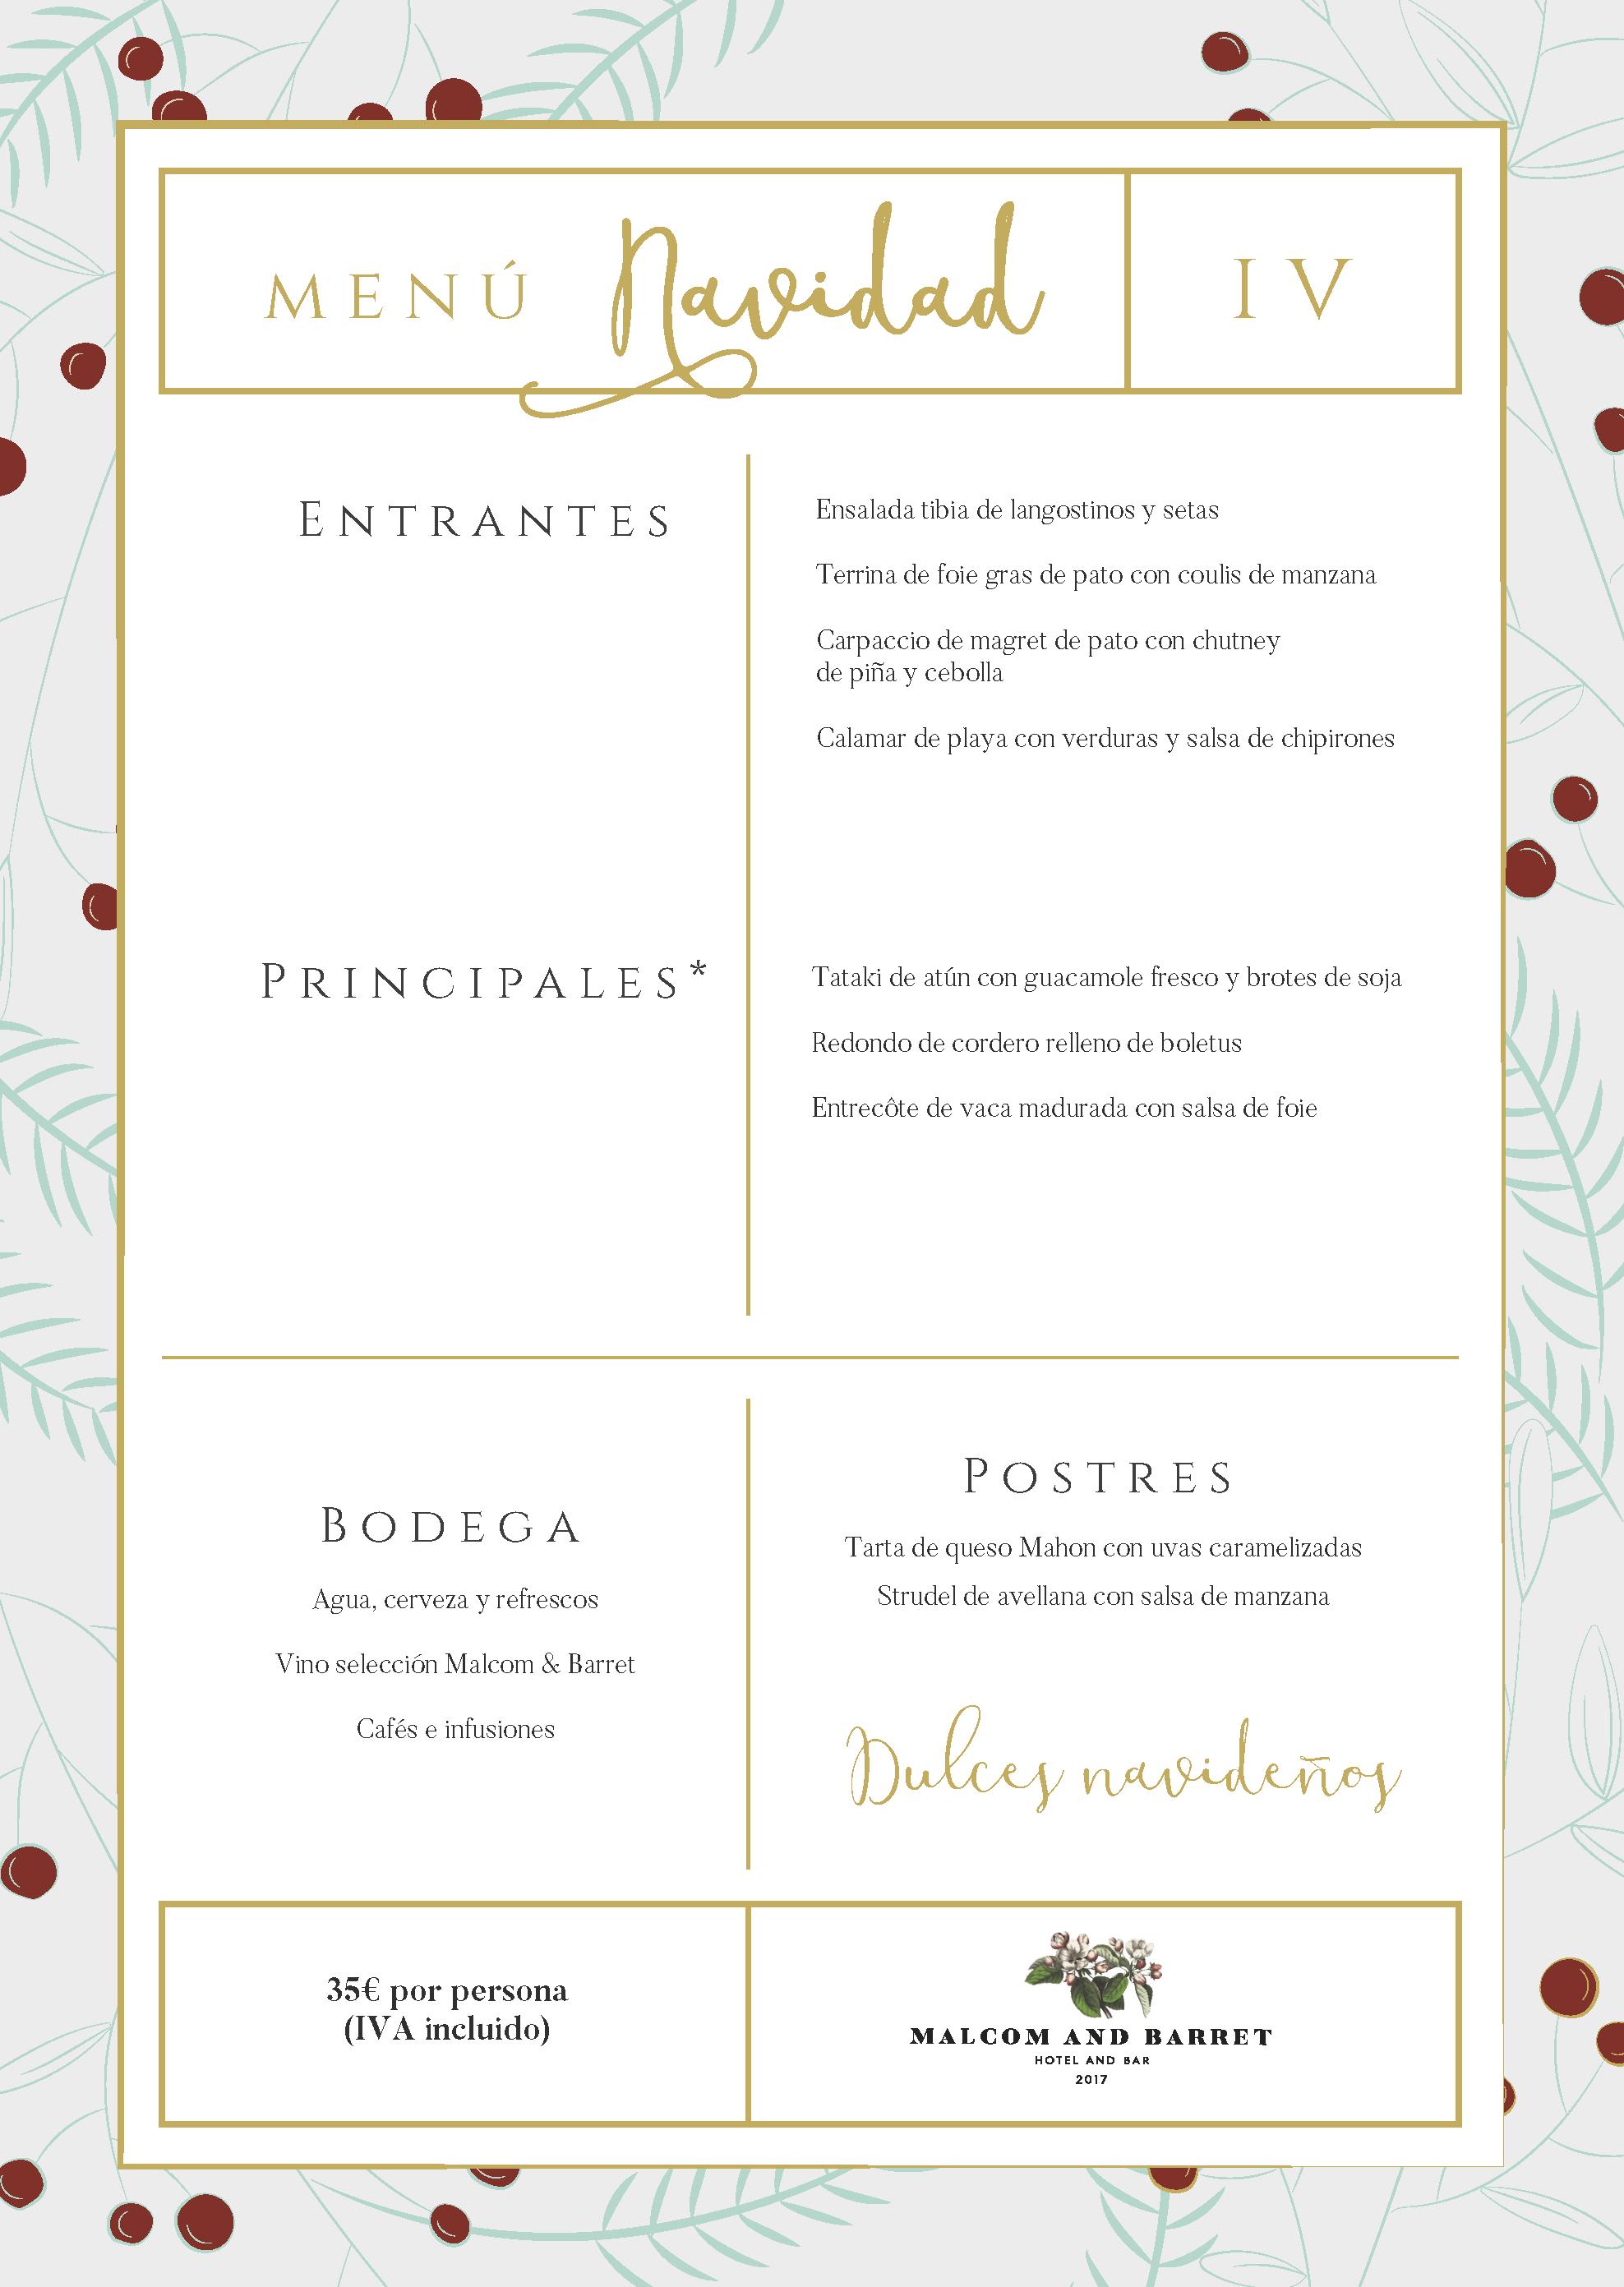 Menú Grupo Navidad Malcom and Barret ES (1)_Página_5